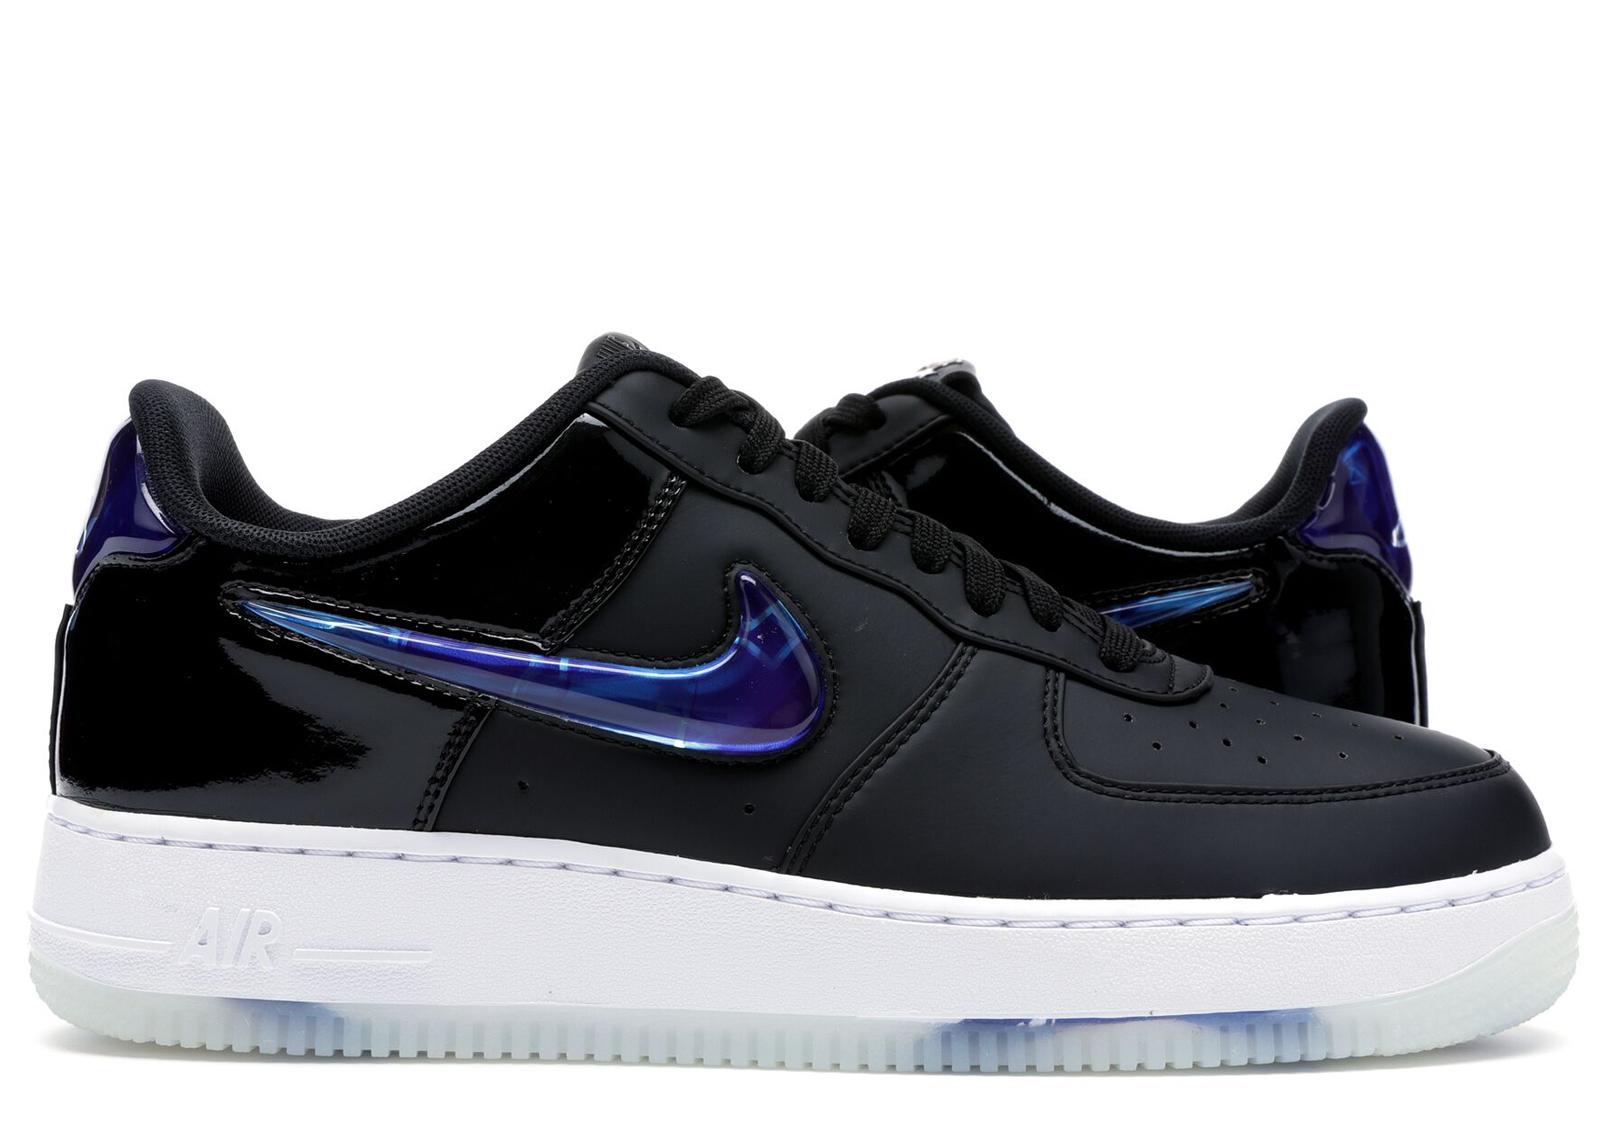 Nike Air Force 1 Low Playstation (2018) - BQ3634-001